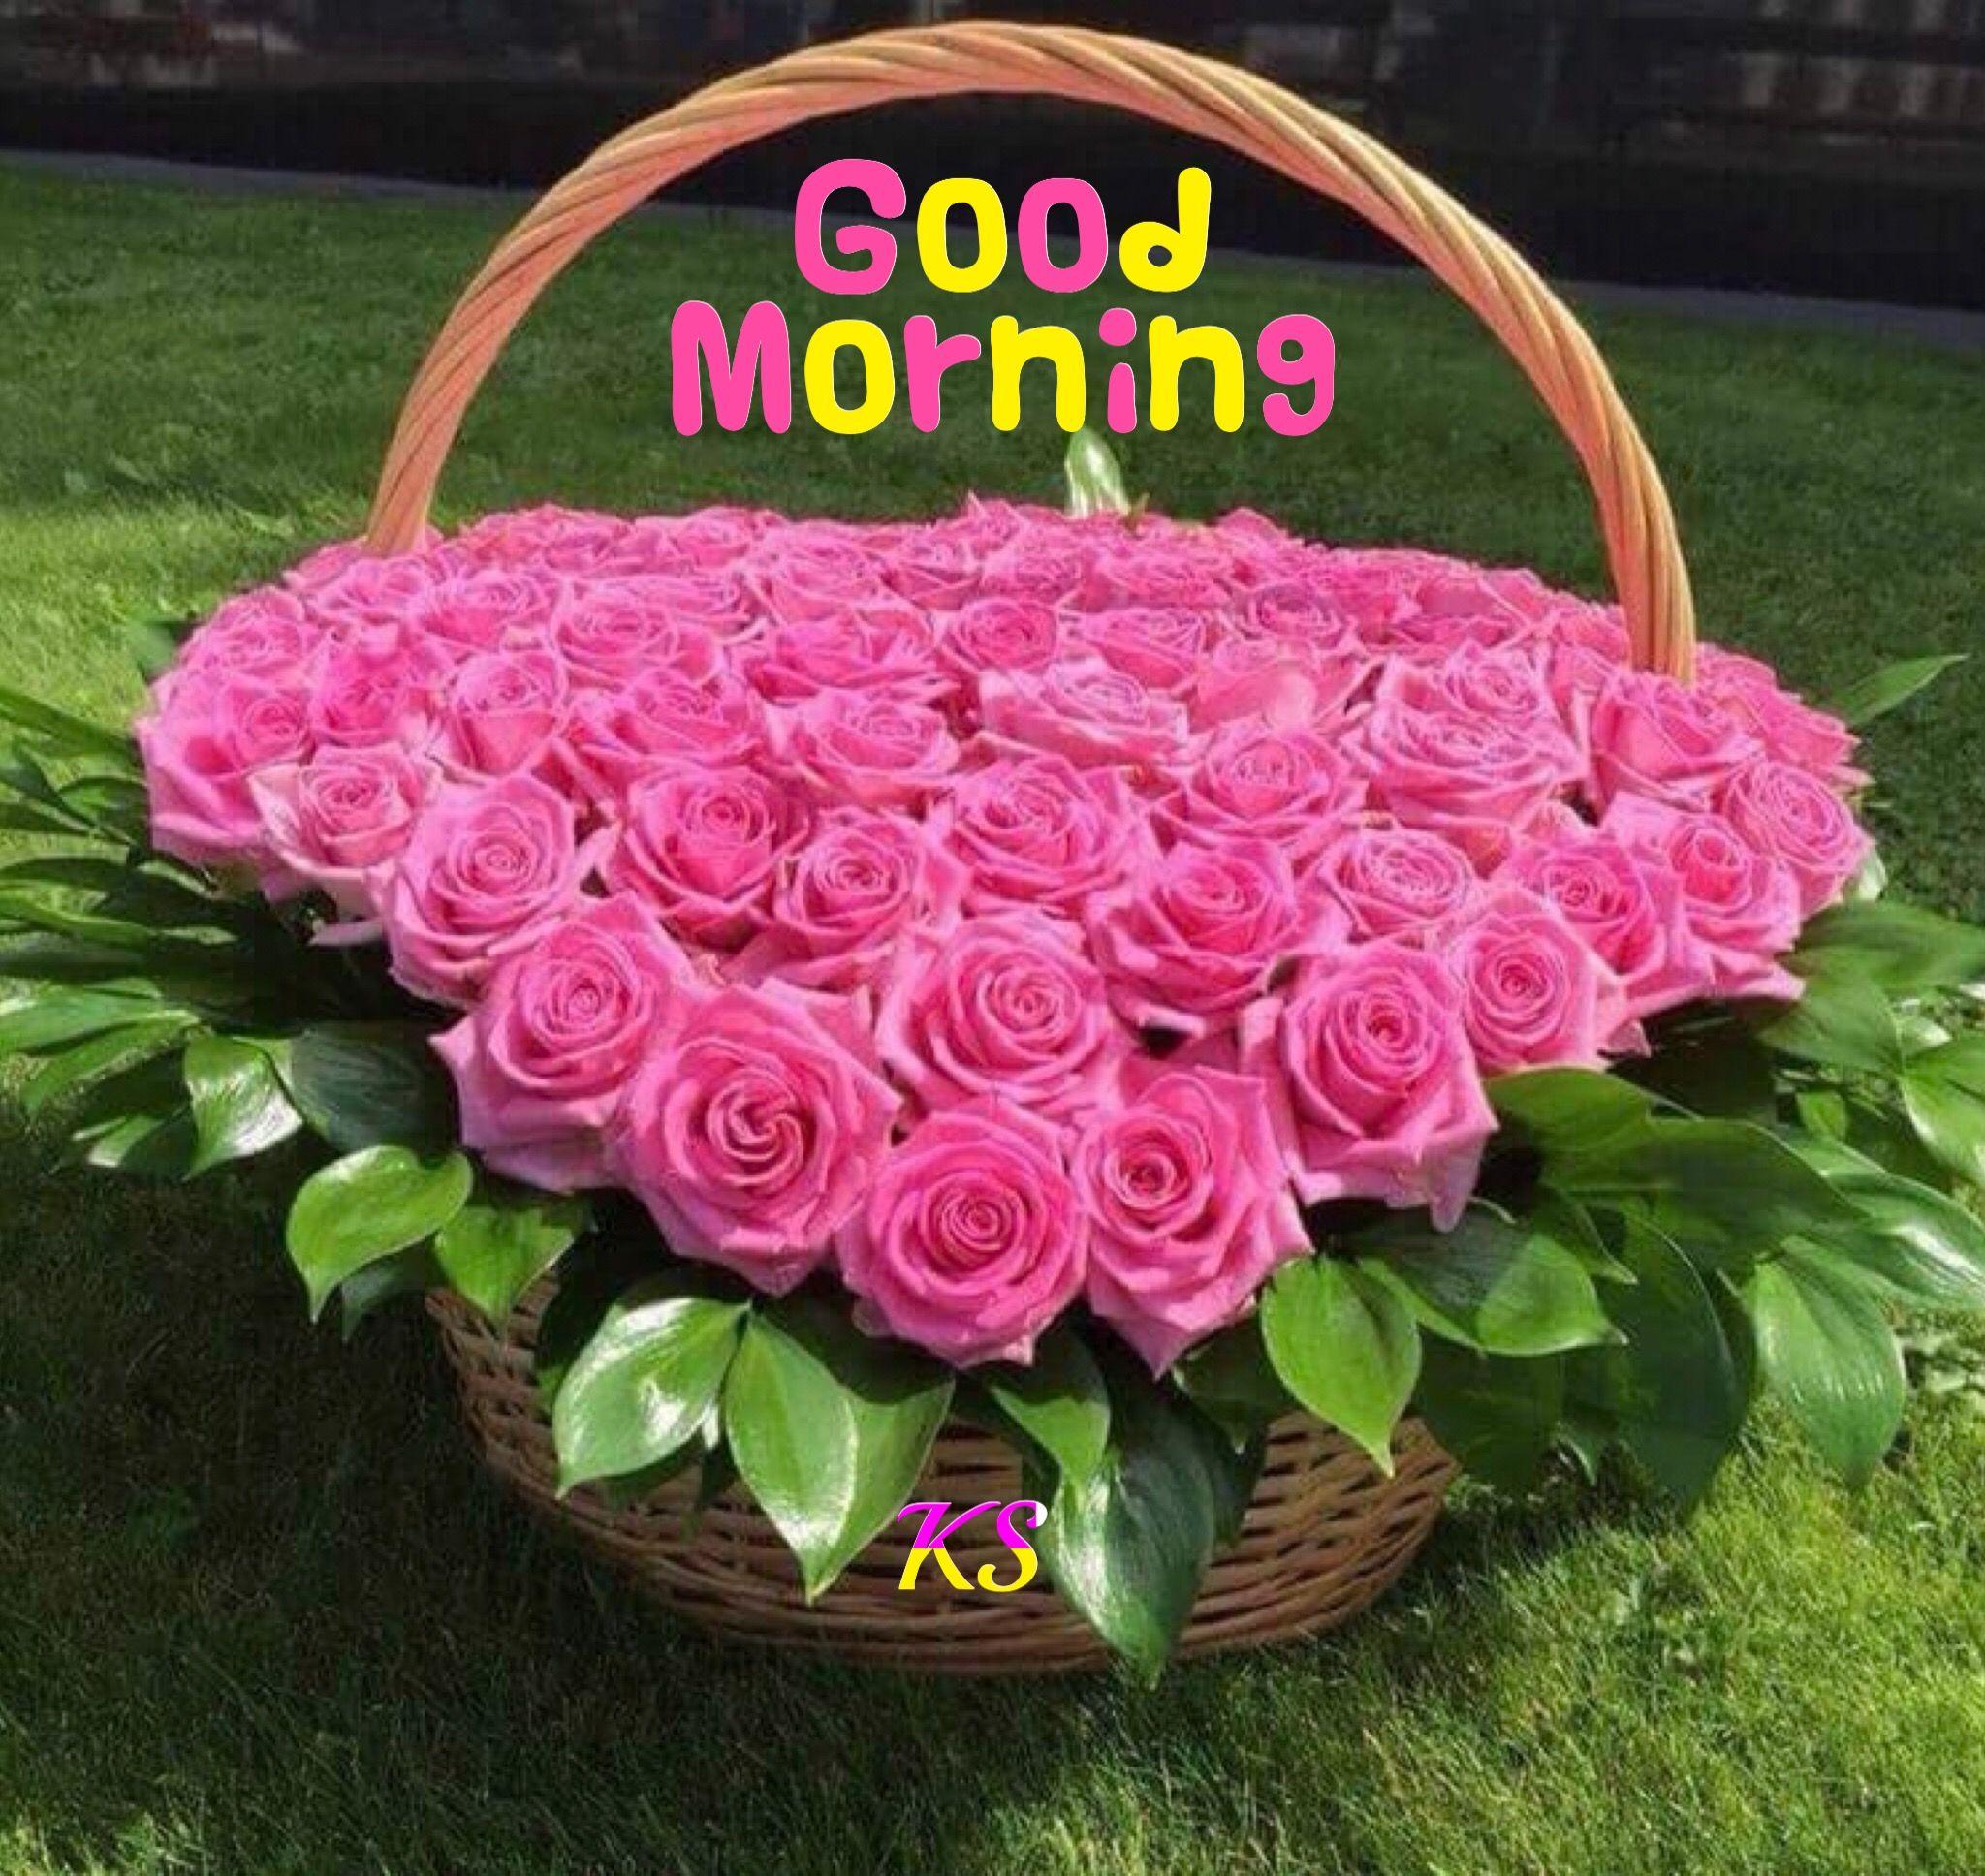 Pin By Kanchan Sunil On Good Morning Pinterest Flowers Pretty